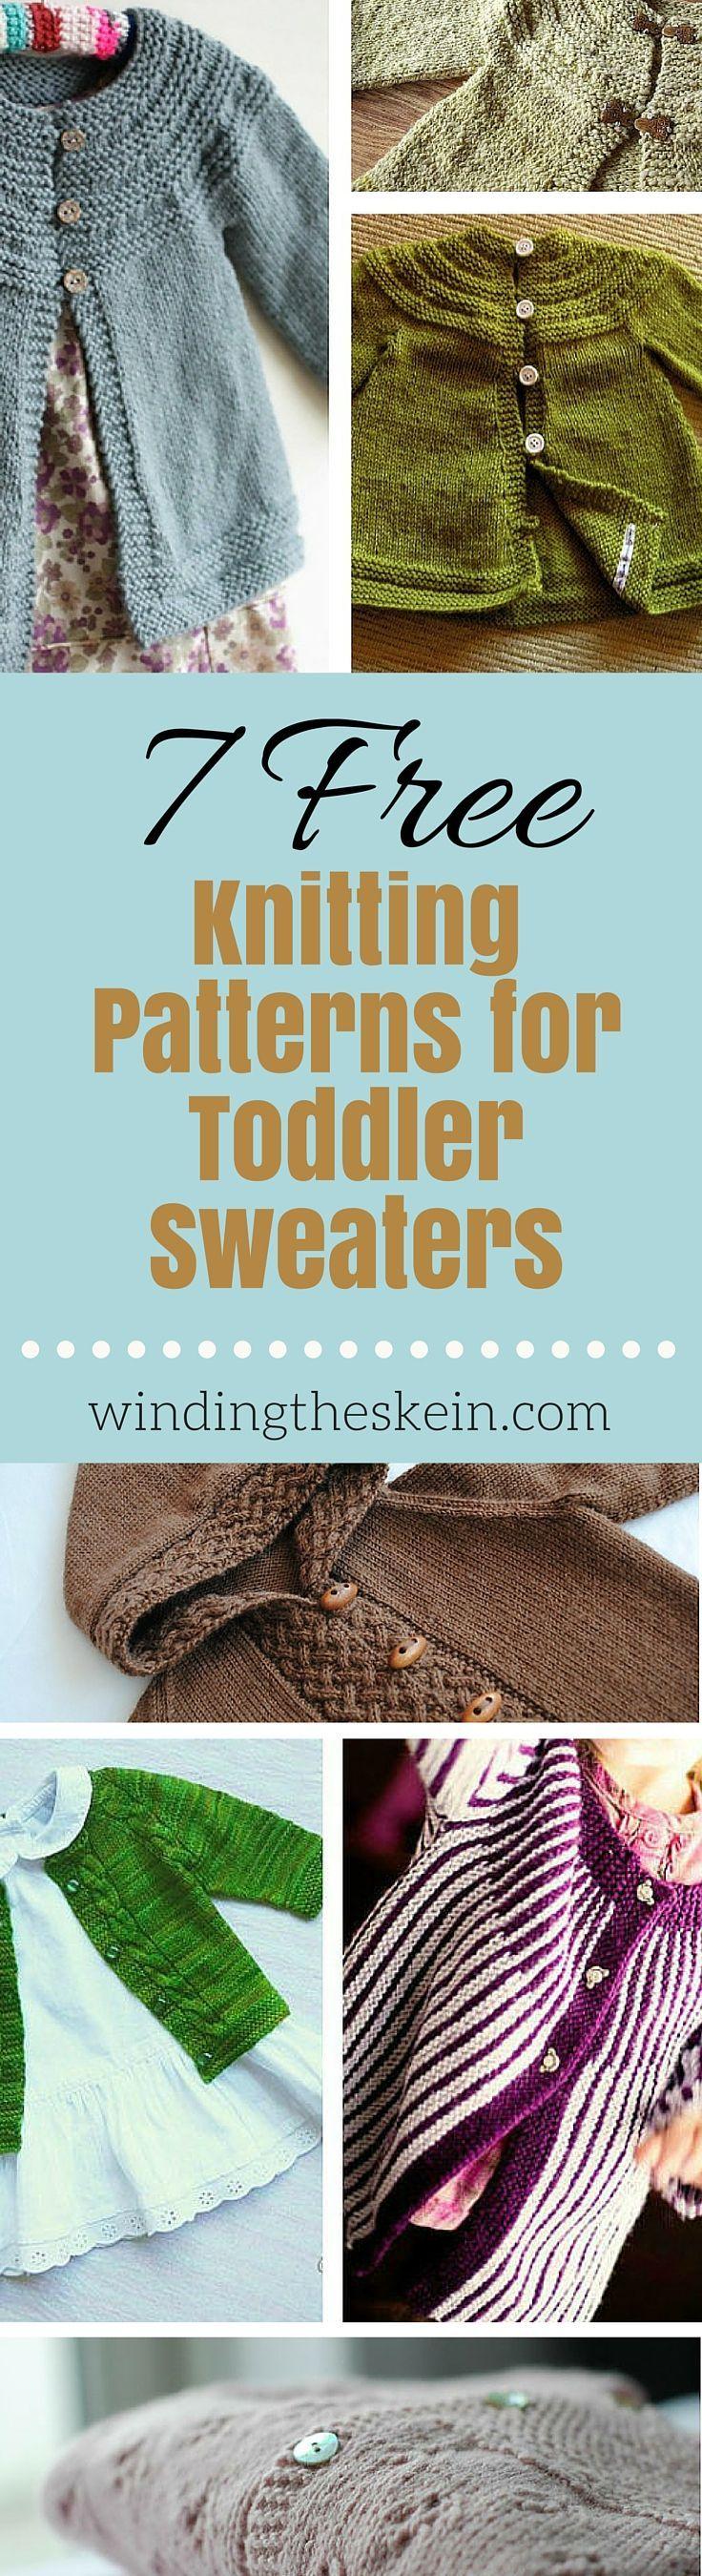 Free Toddler Sweater Knitting Patterns | Knitting sweaters, Knitting ...